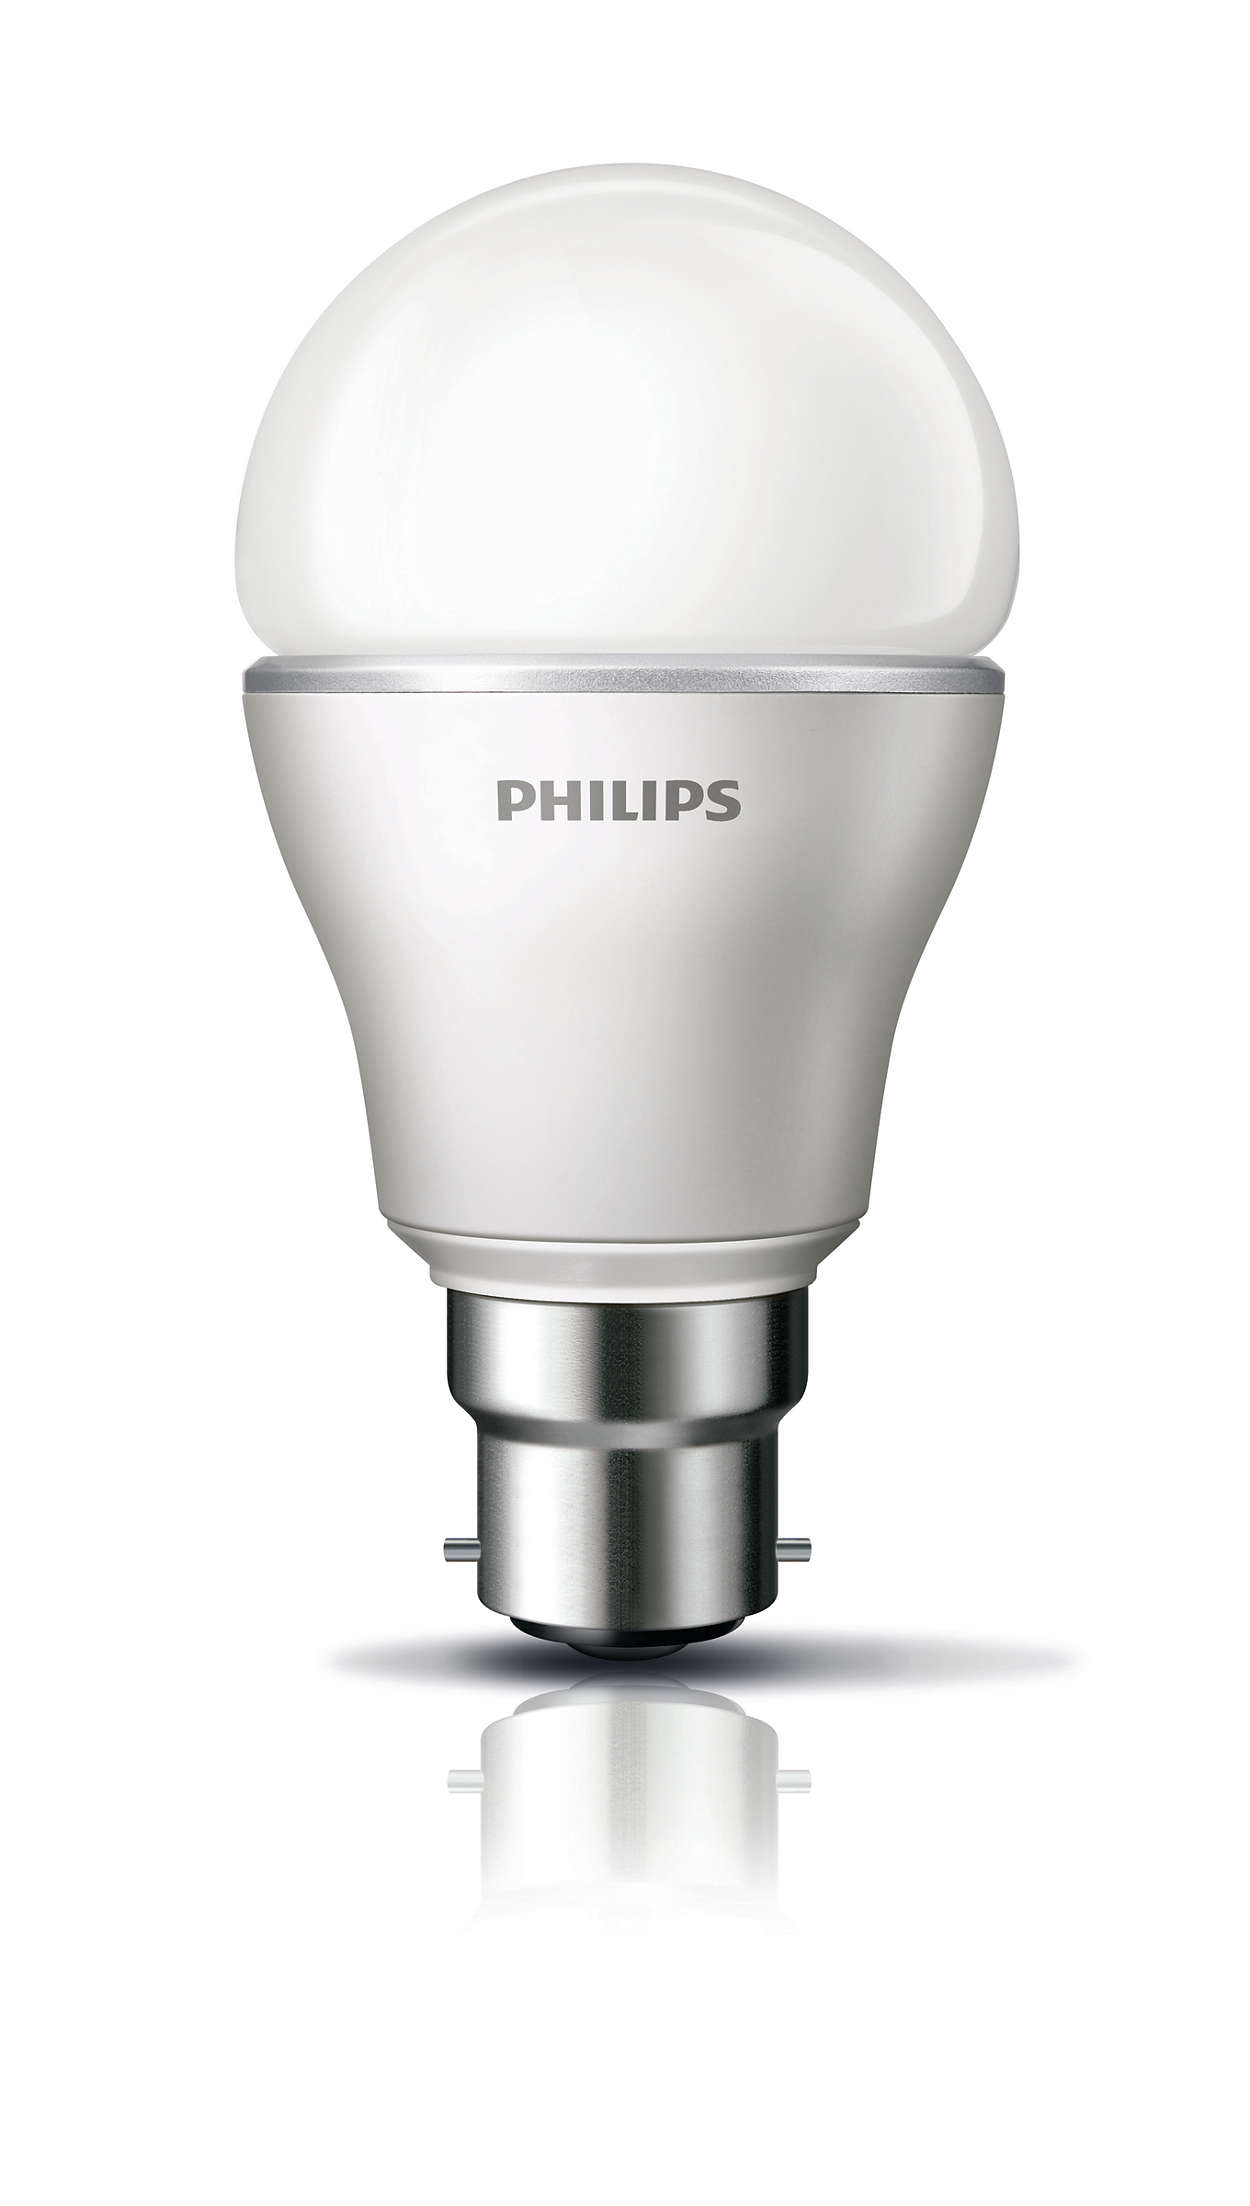 Energibesparende uden kompromis